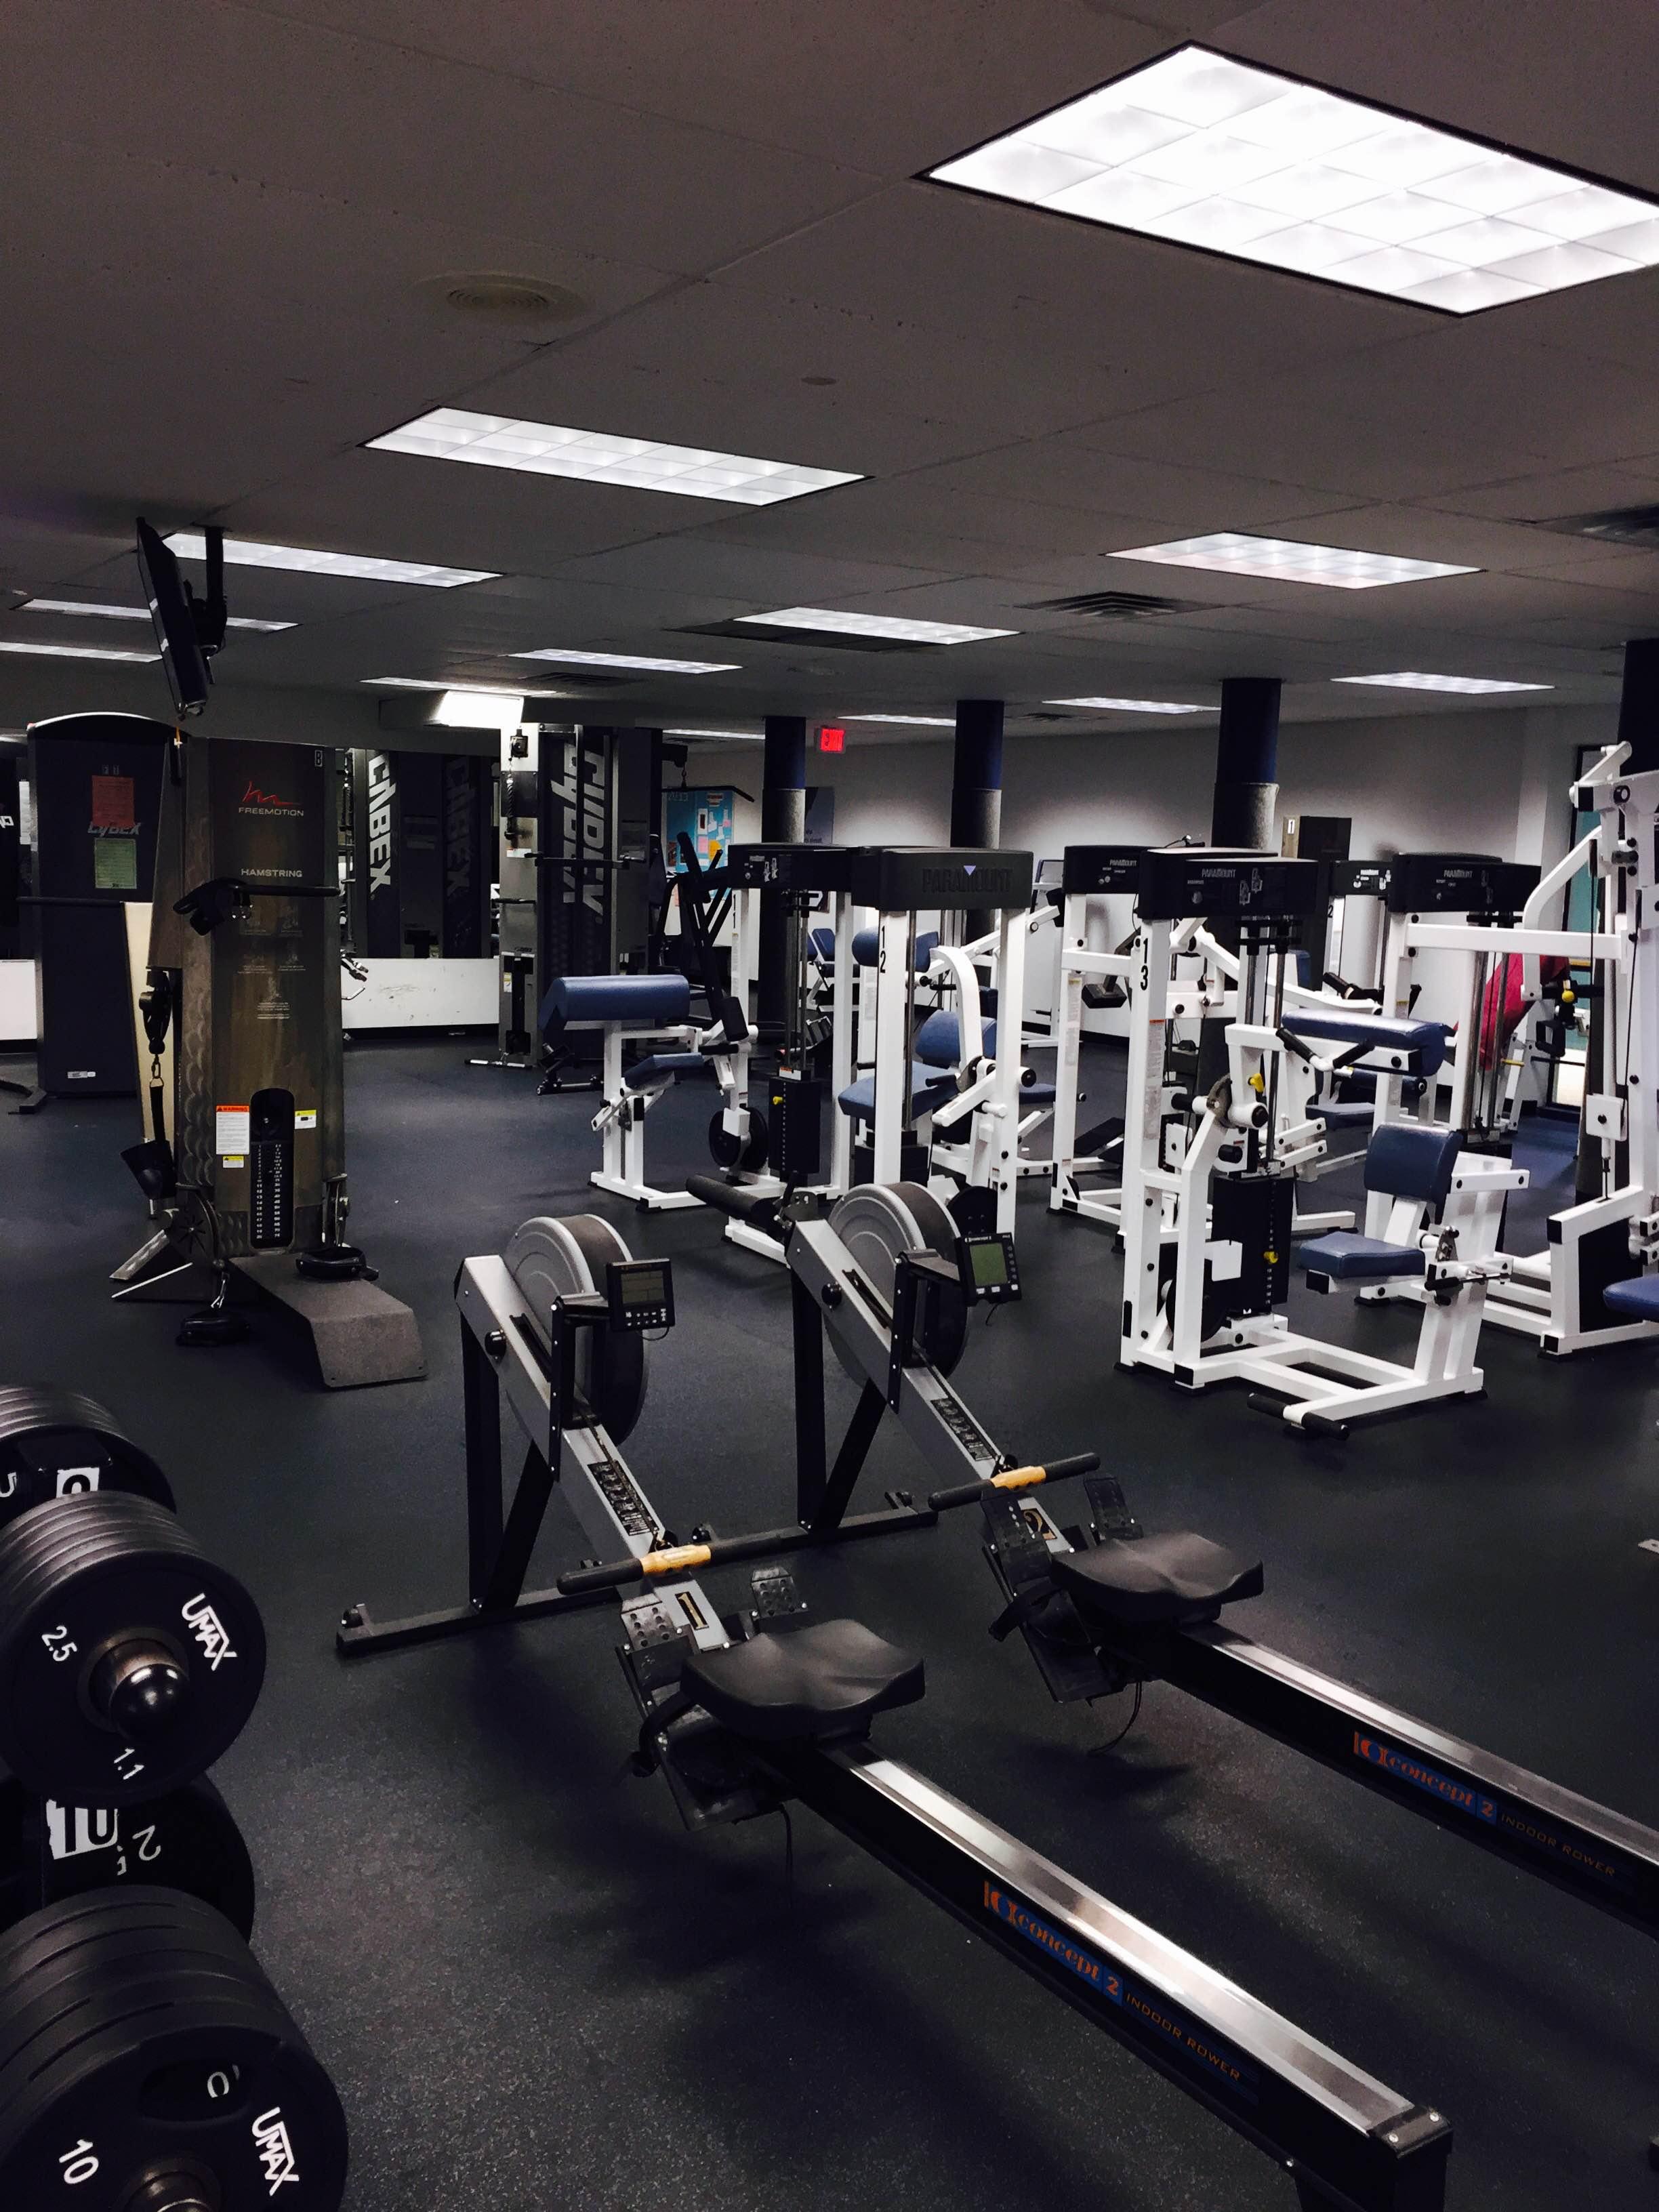 Sidney albert albany jcc the george kasselman fitness center